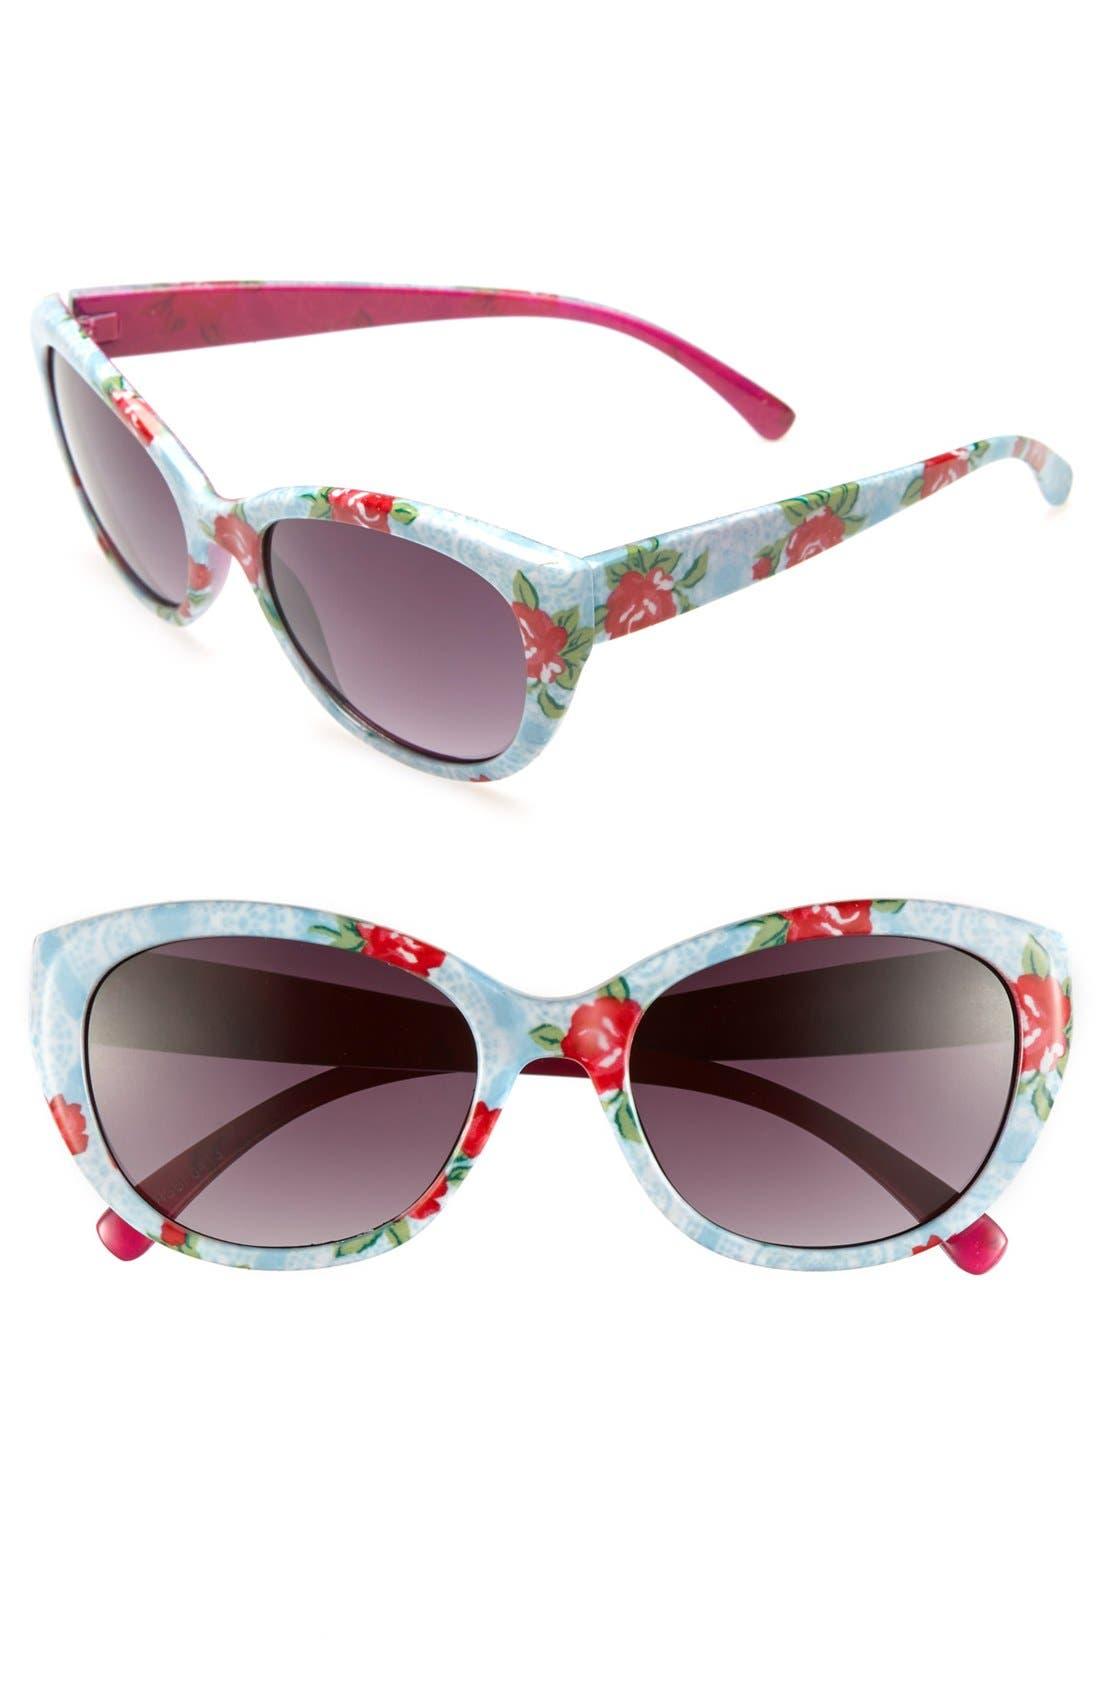 Main Image - Fantas Eyes Cat's Eye Sunglasses (Girls)